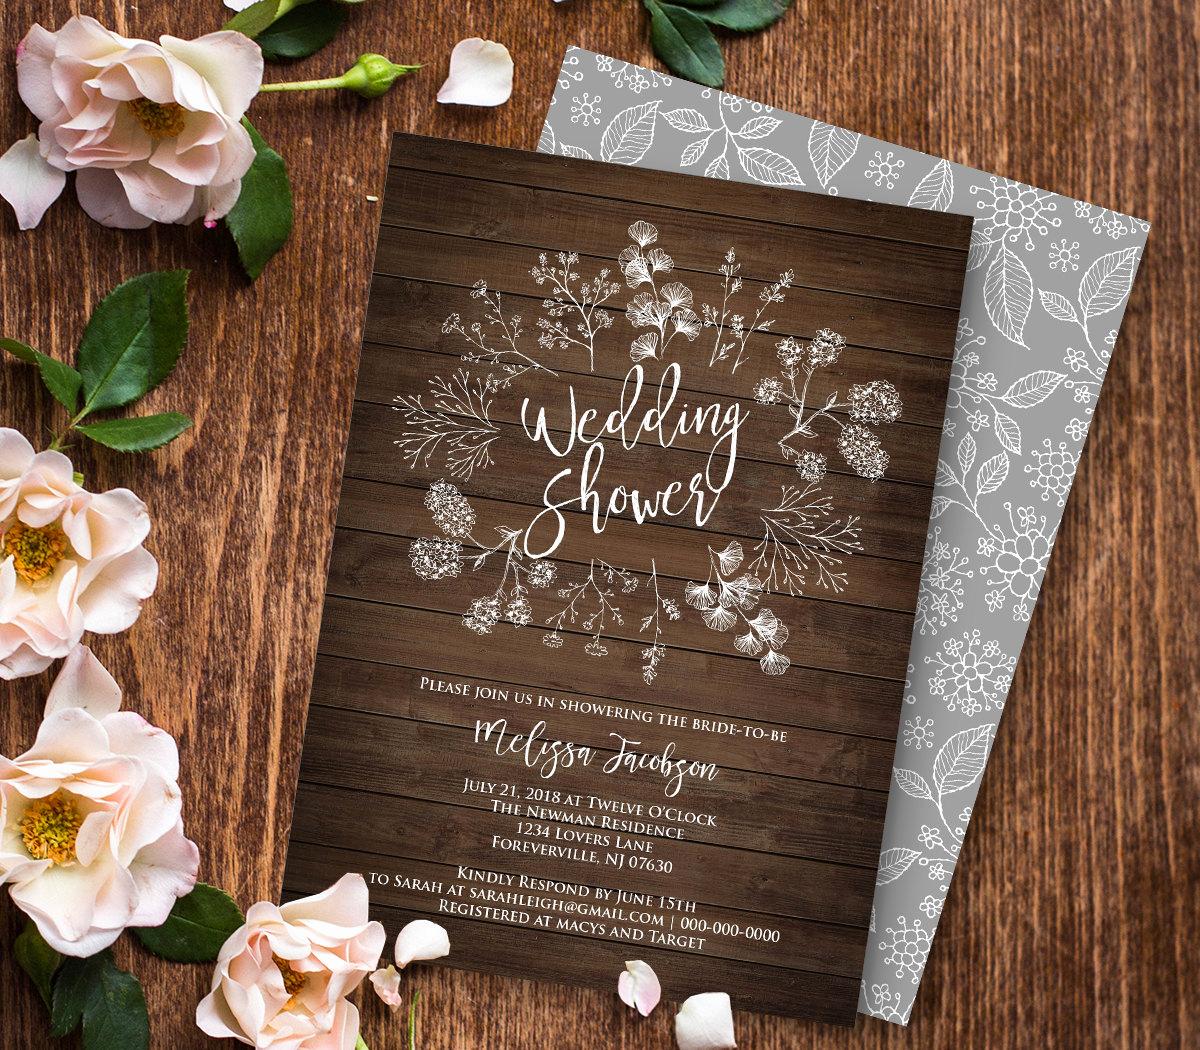 Printable Bridal Shower Invitation Templates Lovely Wedding Shower Invitation Template Couples Shower Printable